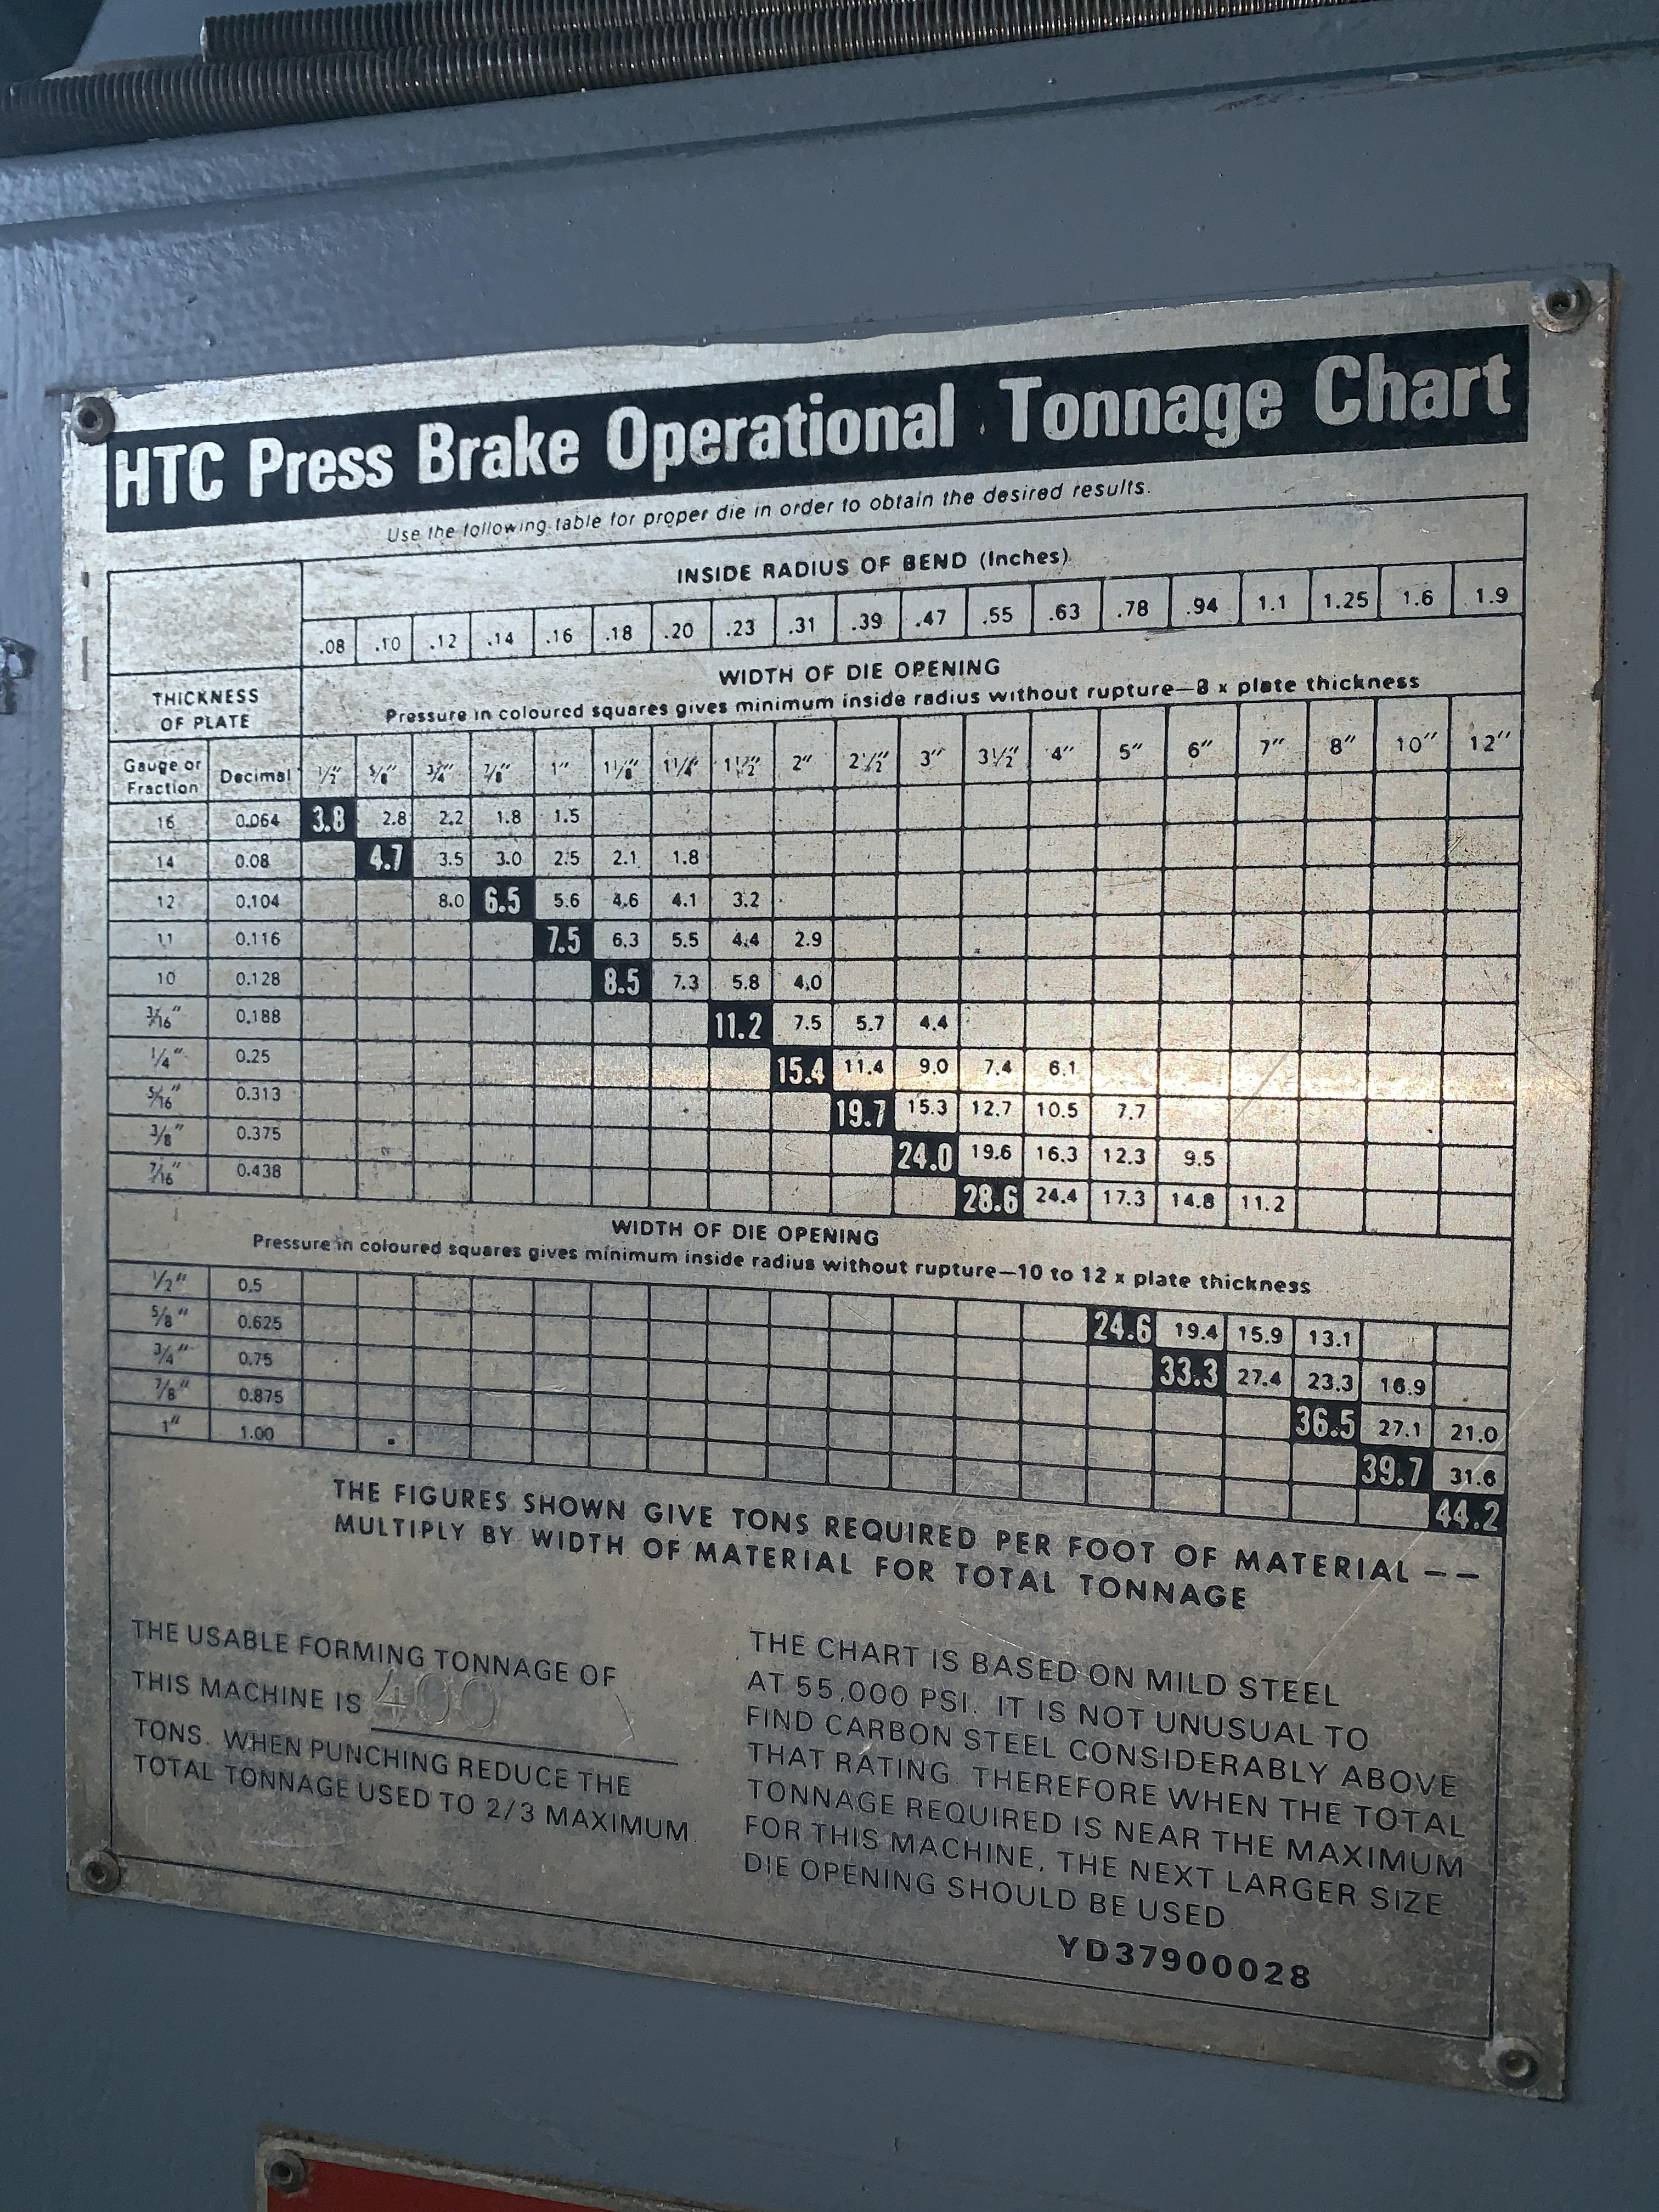 400 TON x 12' HTC MODEL 400-12H HYDRAULIC PRESS BRAKE: STOCK #10320